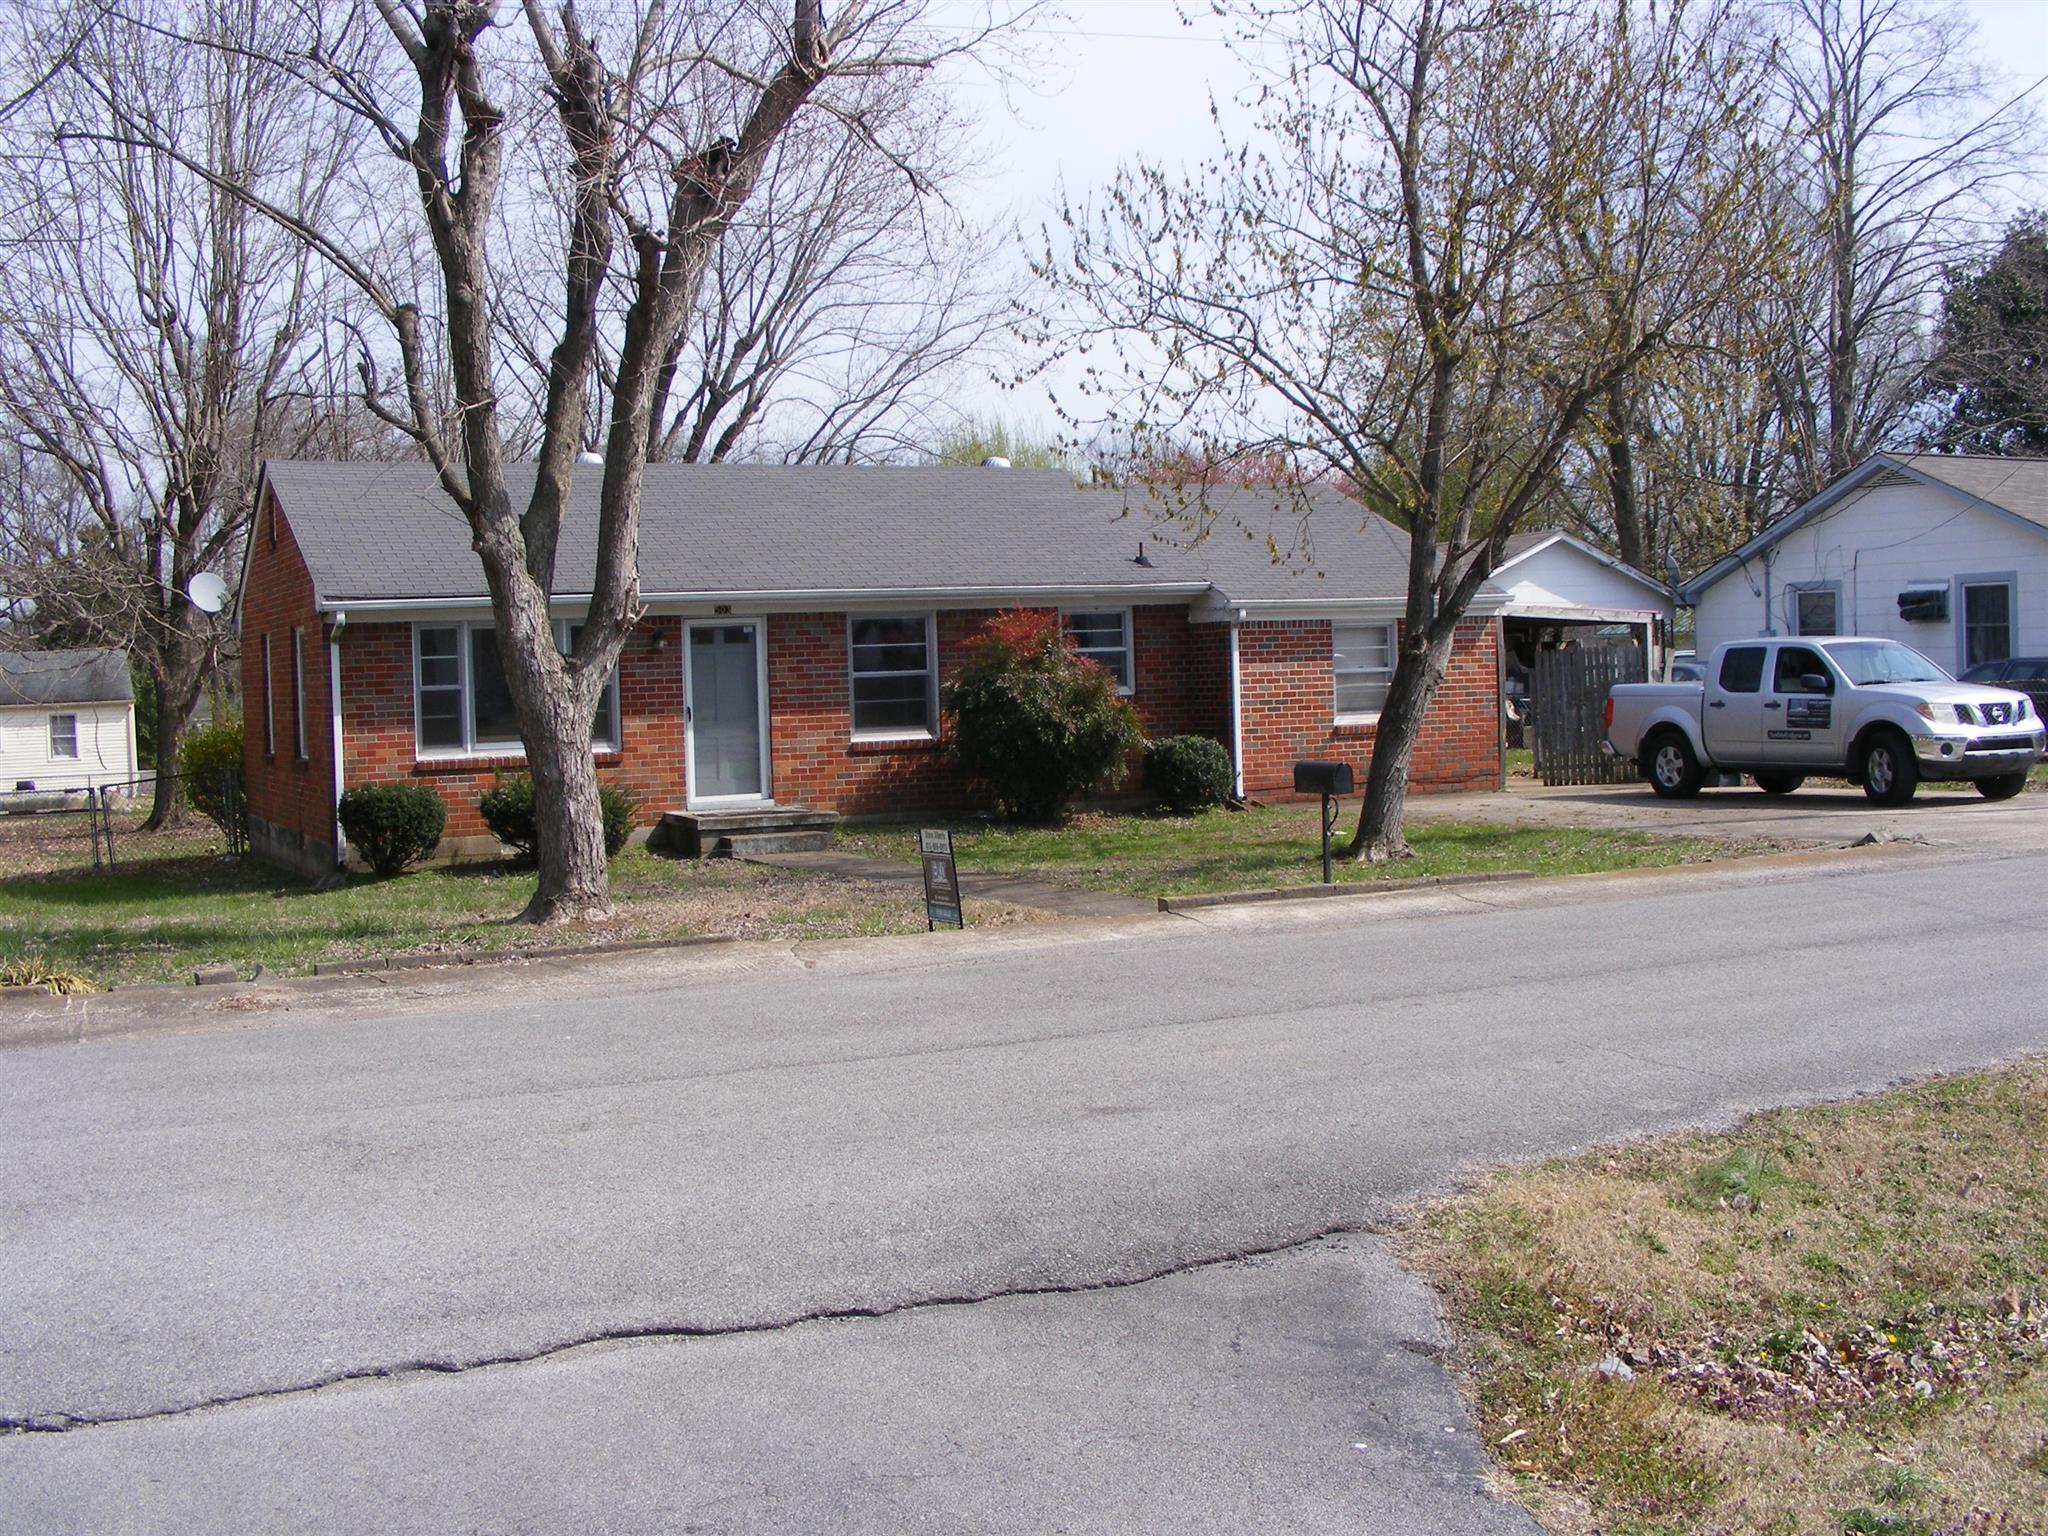 503 Virginia Ave, Gallatin, TN 37066